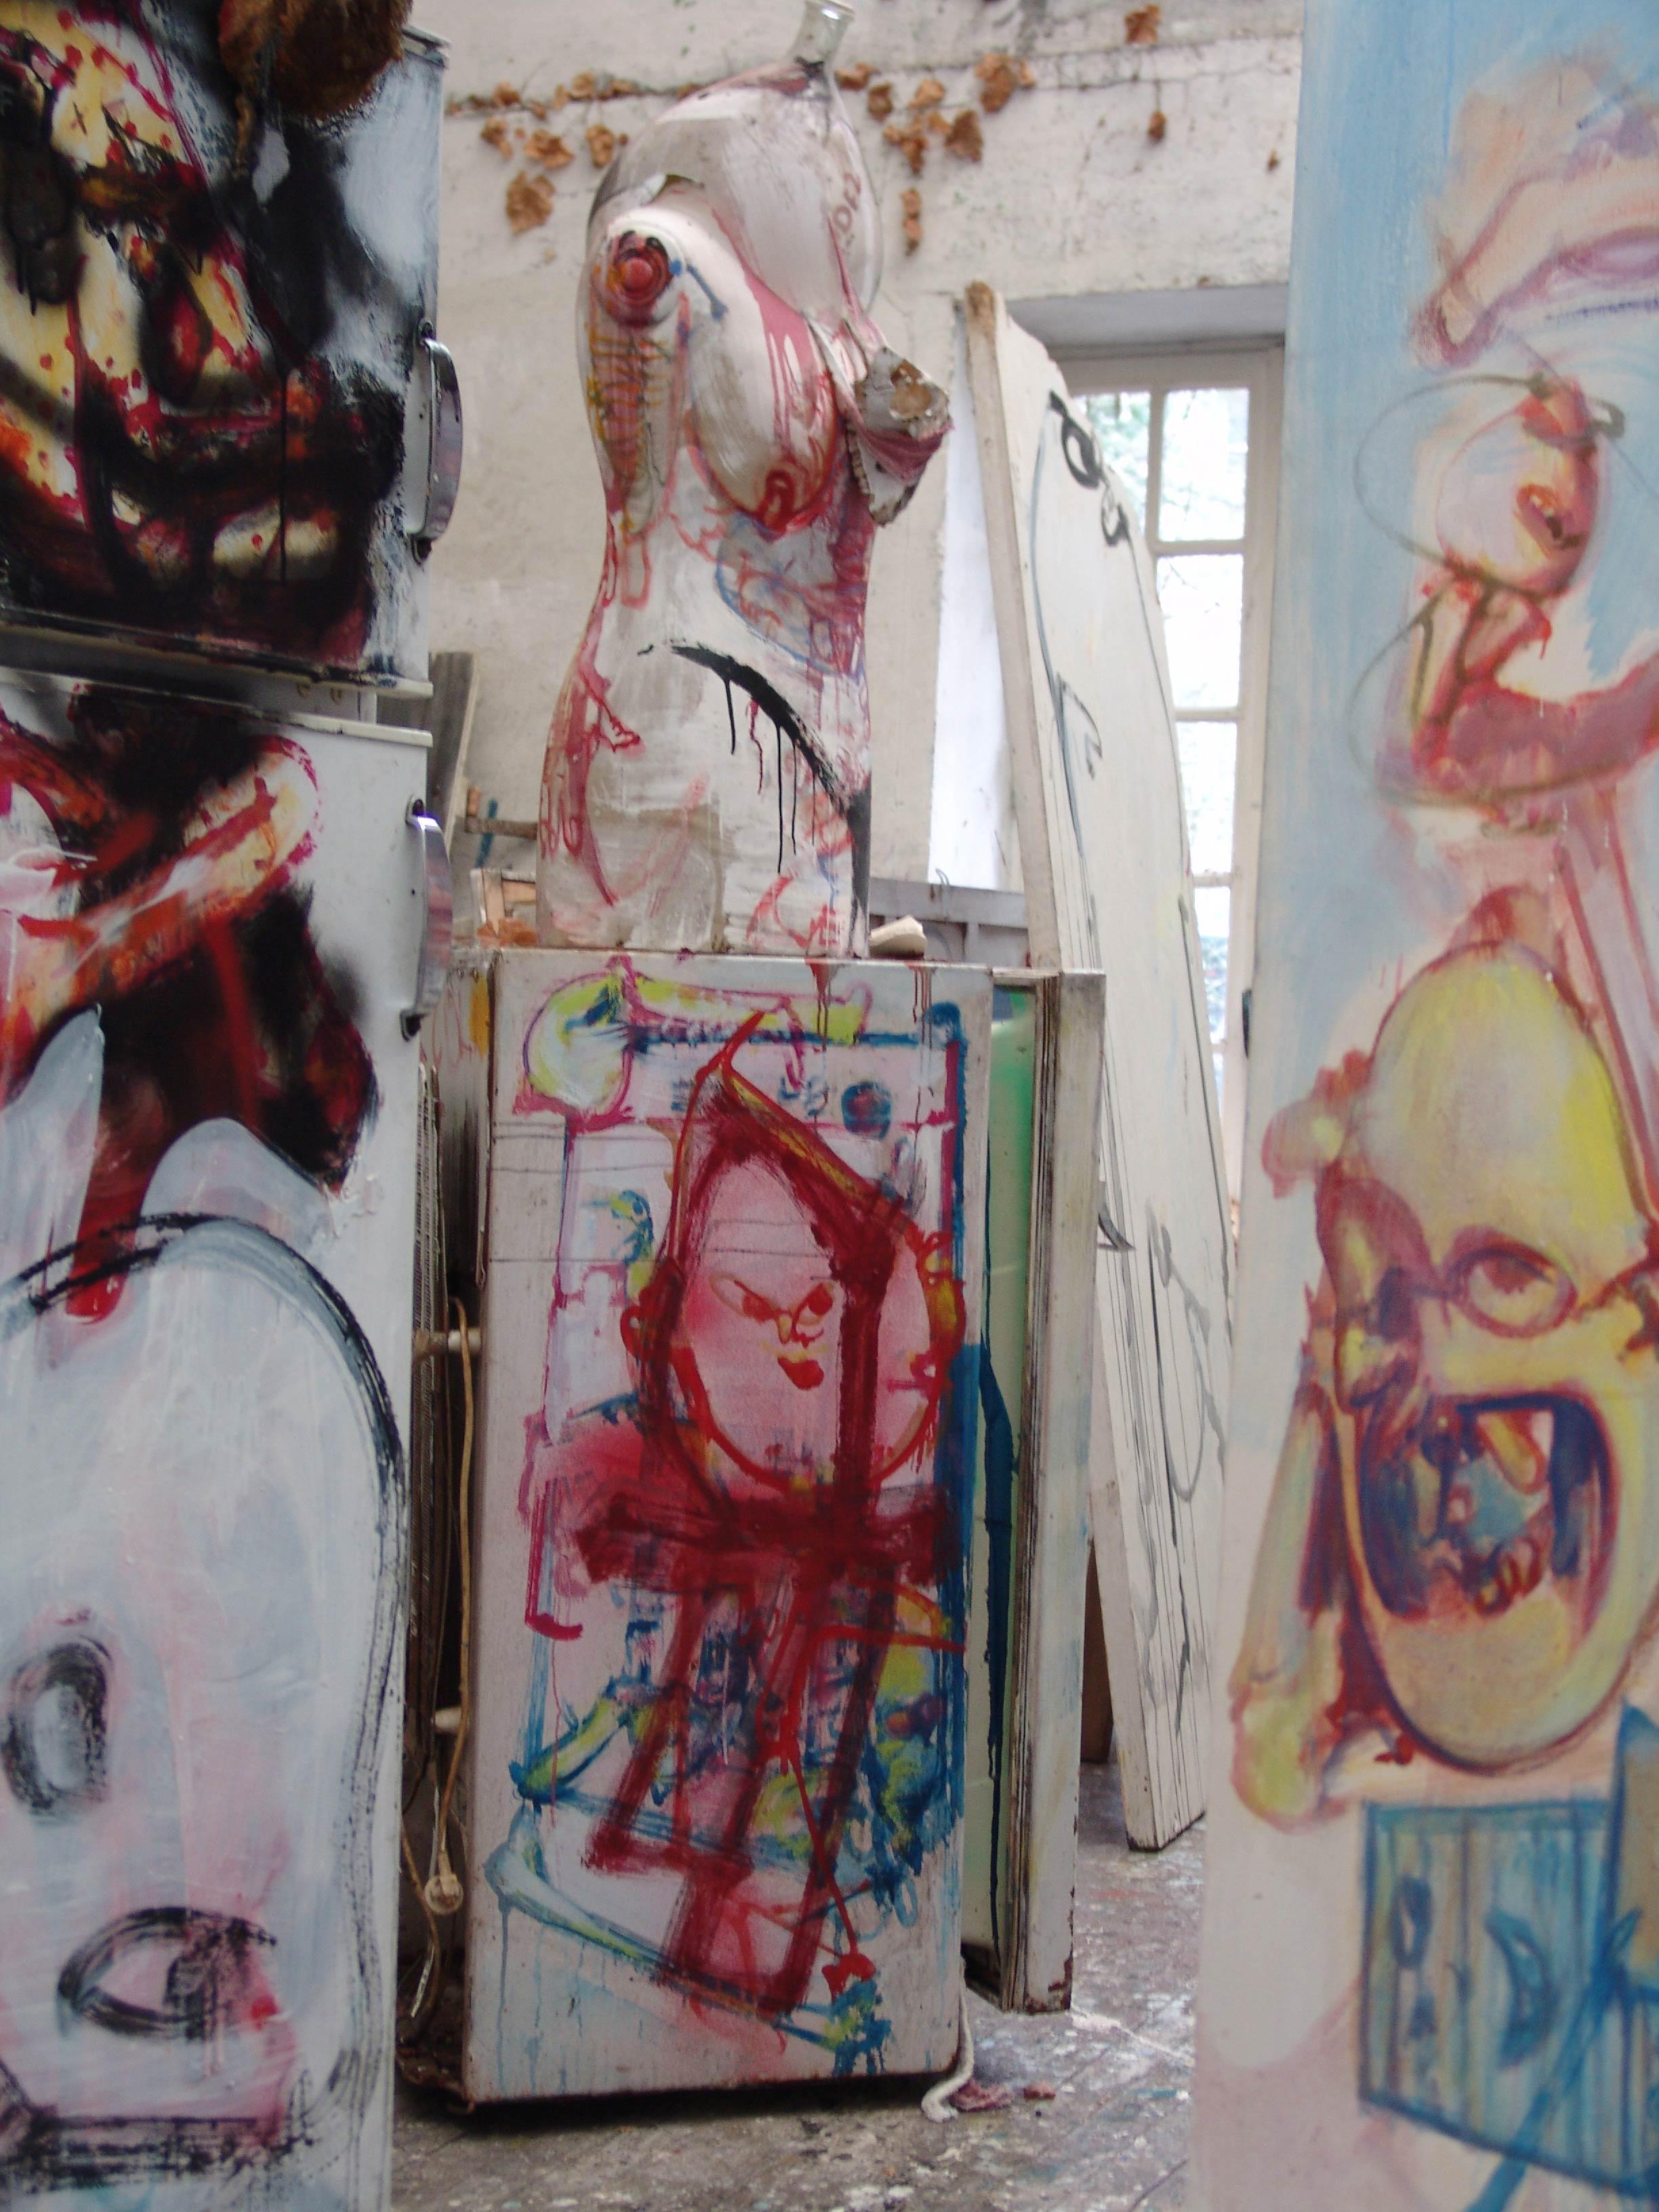 Sculptures at Dado's studio in 2010